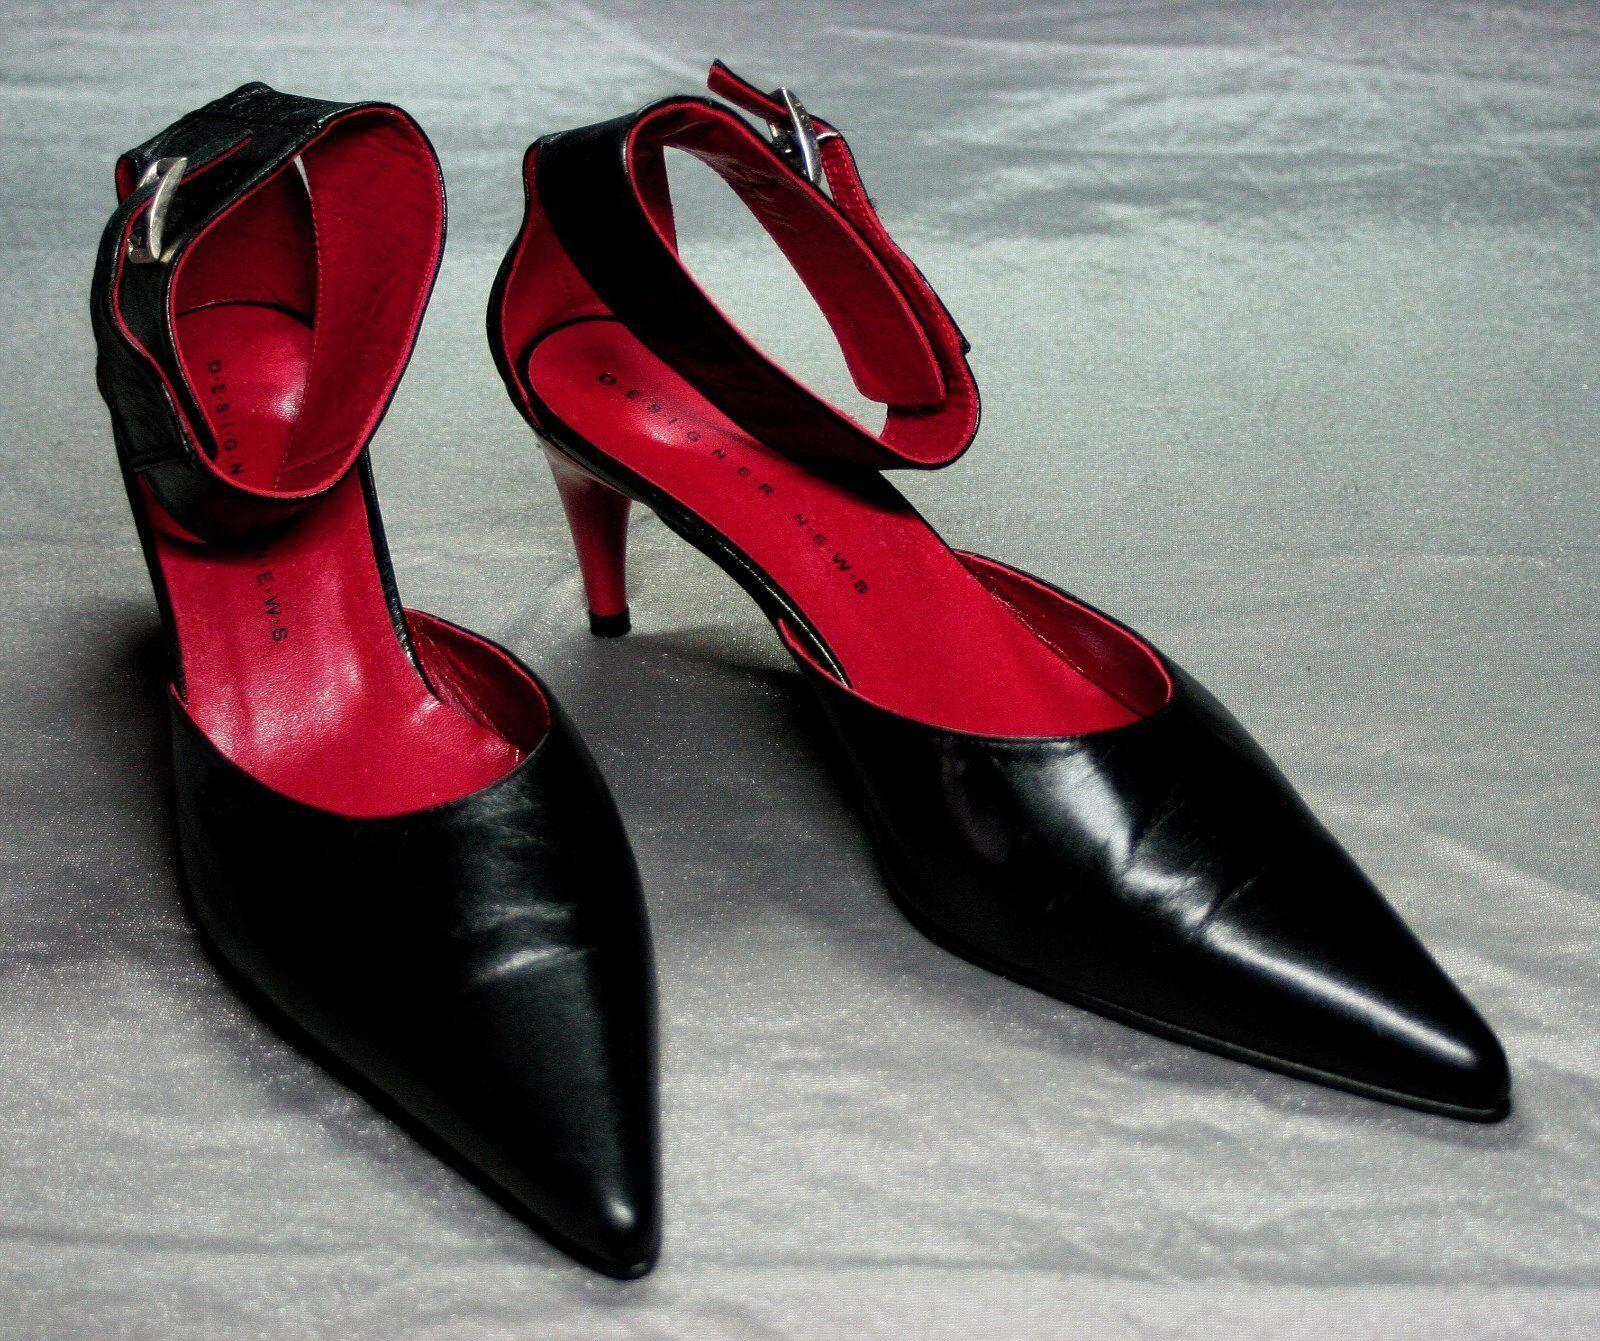 Pumps D.e.s.i.g.n.e.r. N.e.w.s.schwarz-rot Leder Knöchelriemen Gr.40  Absatz 7cm